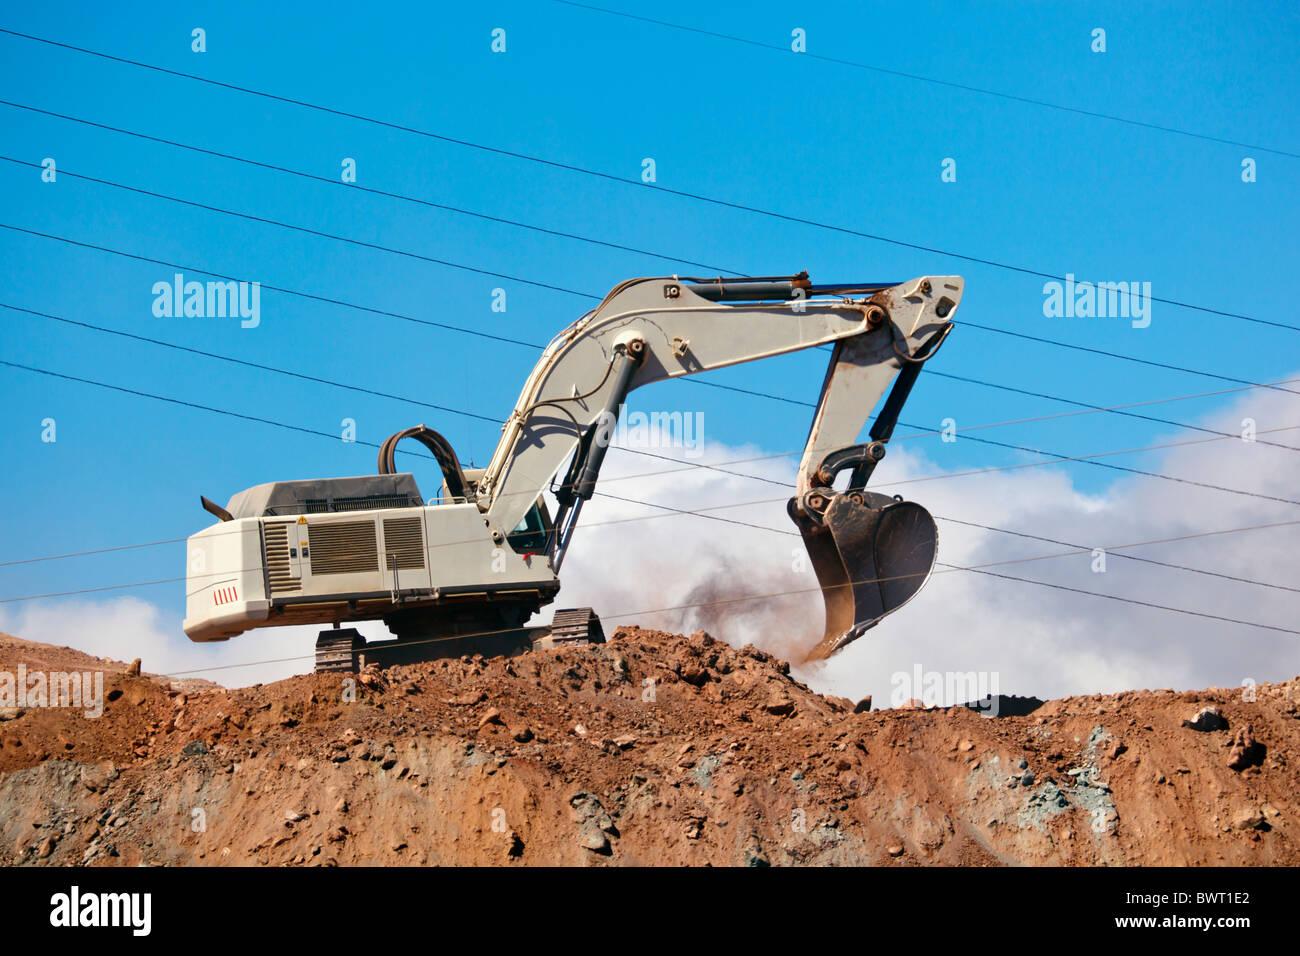 Mechanical backhoe shovel at work on a building site near Algeciras, Cadiz Province, Spain. - Stock Image